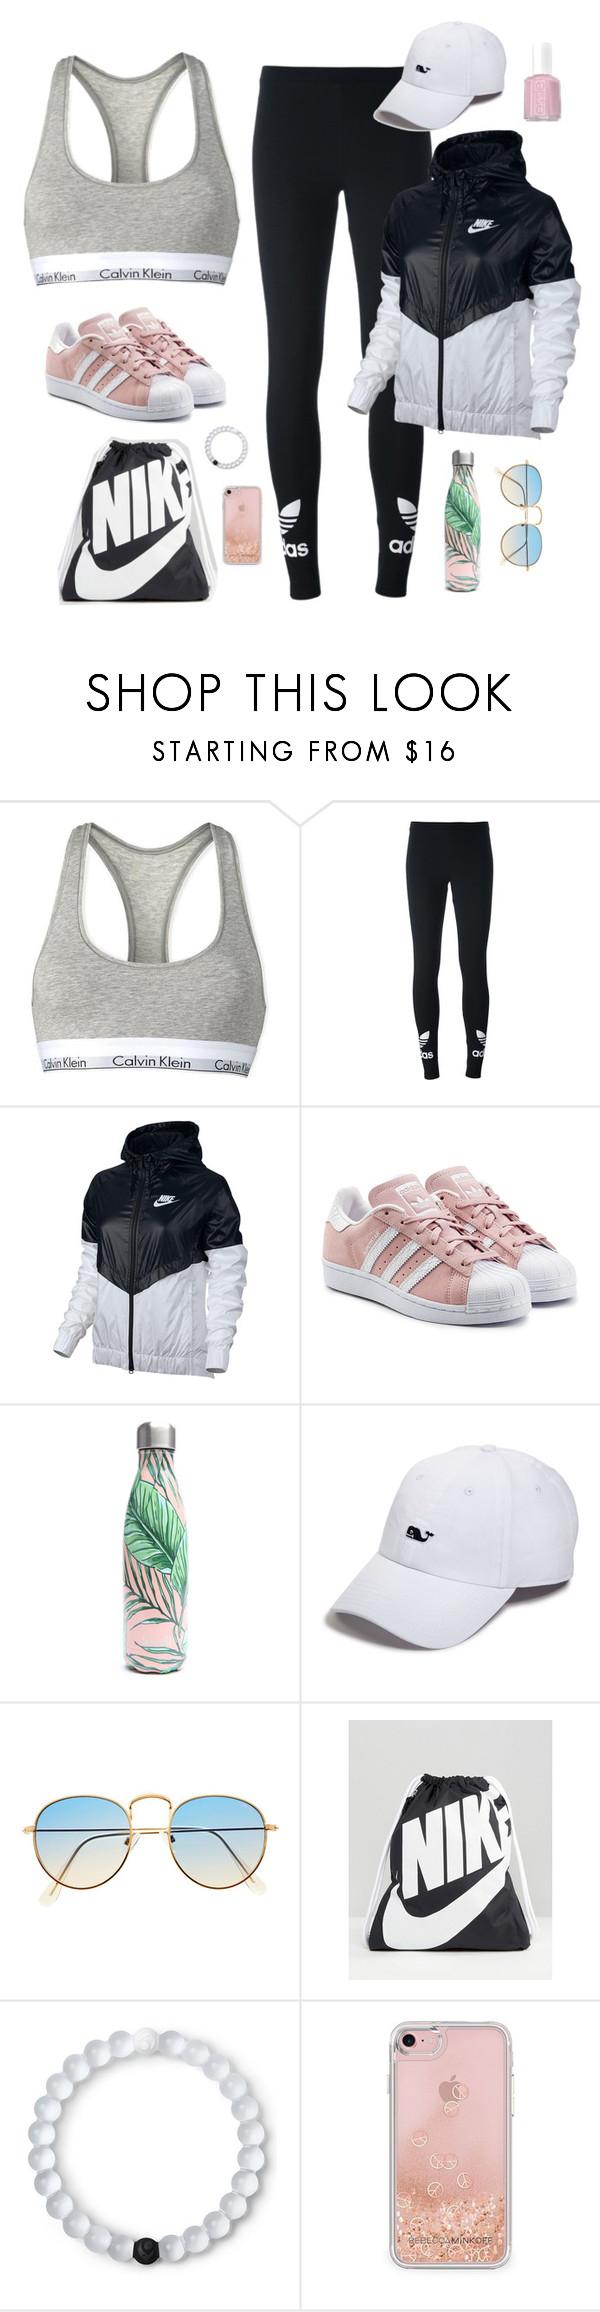 """Wish list"" by jjjunebug2 ❤ liked on Polyvore featuring Calvin Klein, adidas Originals, NIKE, S'well, Vineyard Vines, Lokai, Rebecca Minkoff and Essie"